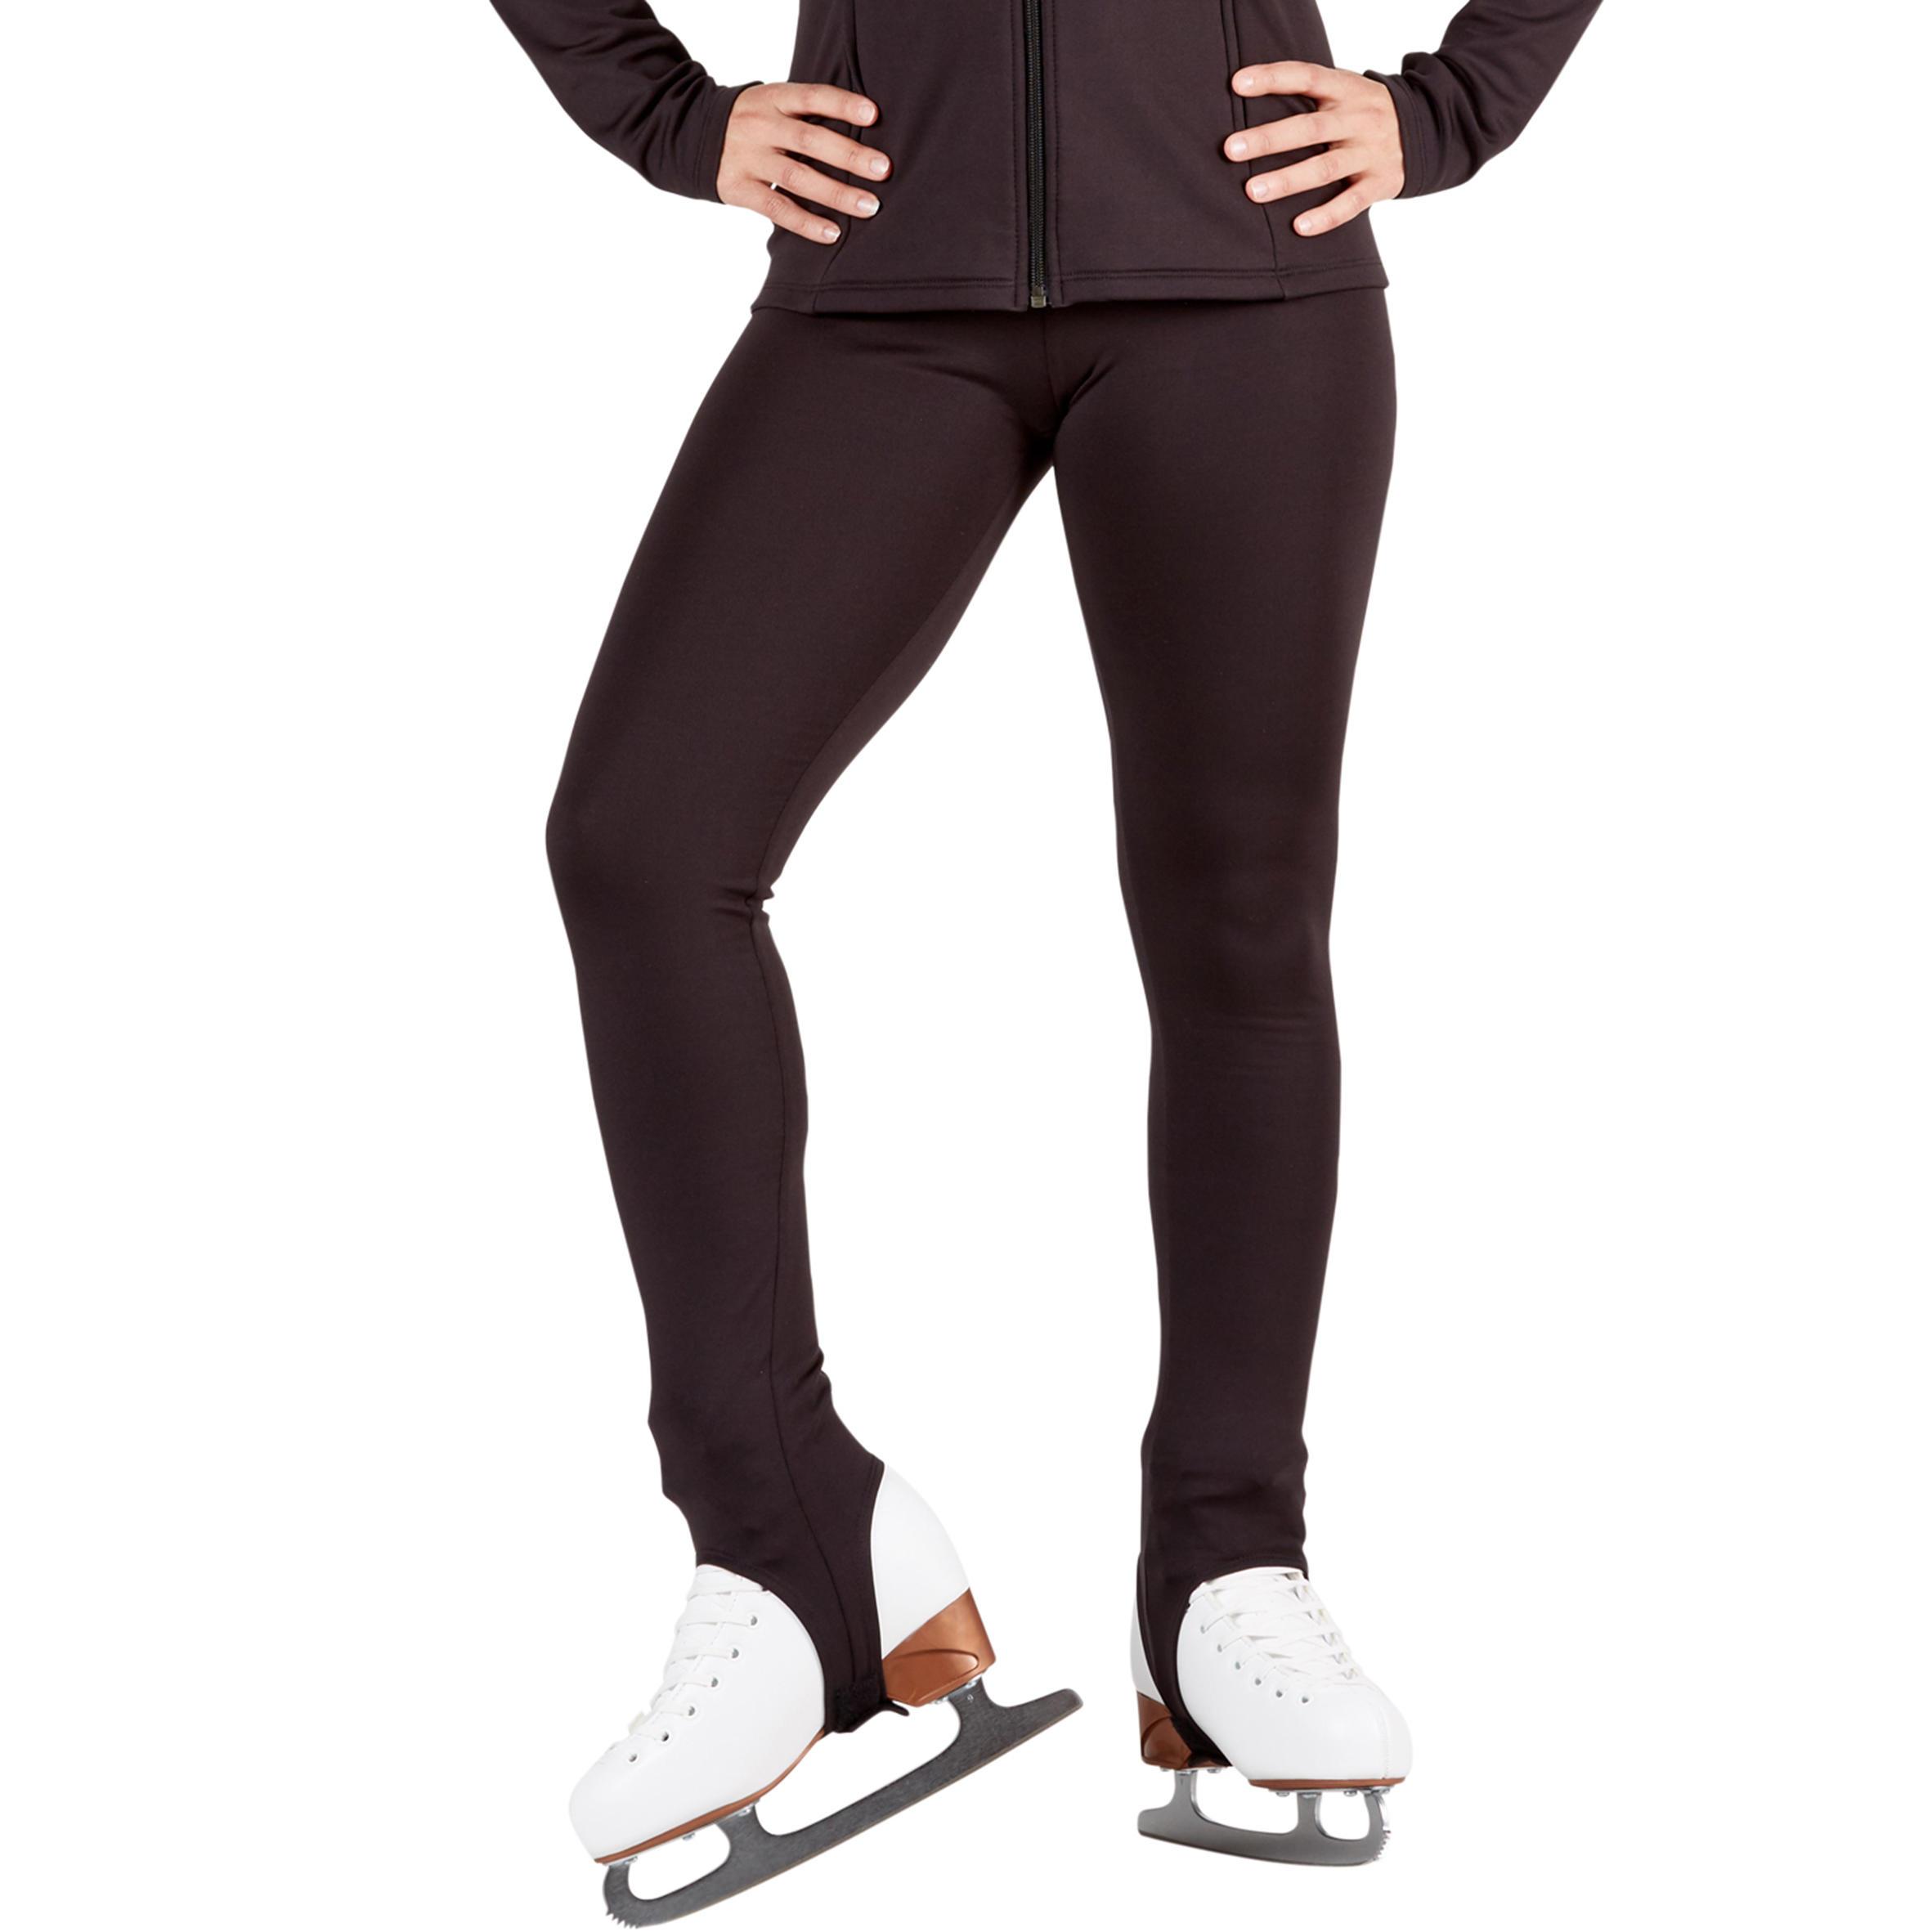 Adult Figure Skating Training Bottoms - Black